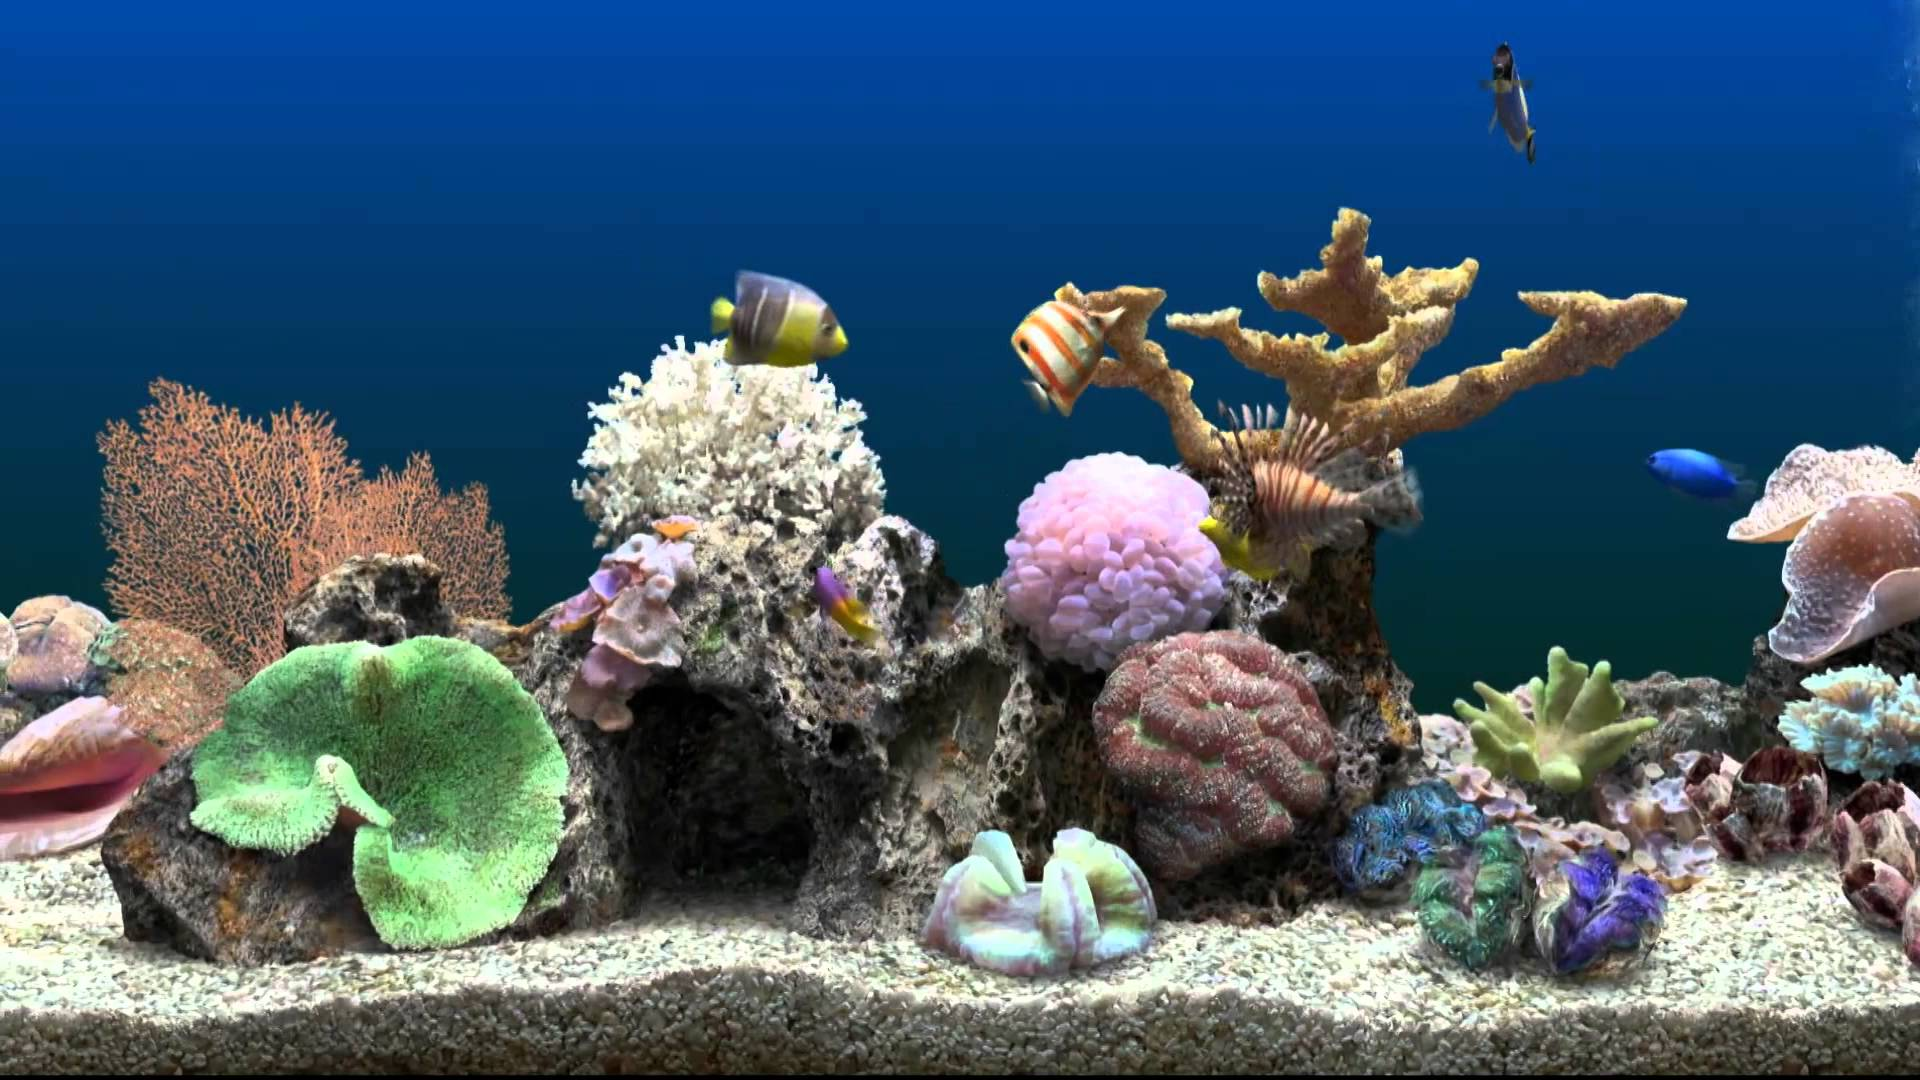 Clown Fish Hd Wallpaper Iphone 4 Fish Tank Backgrounds Pixelstalk Net